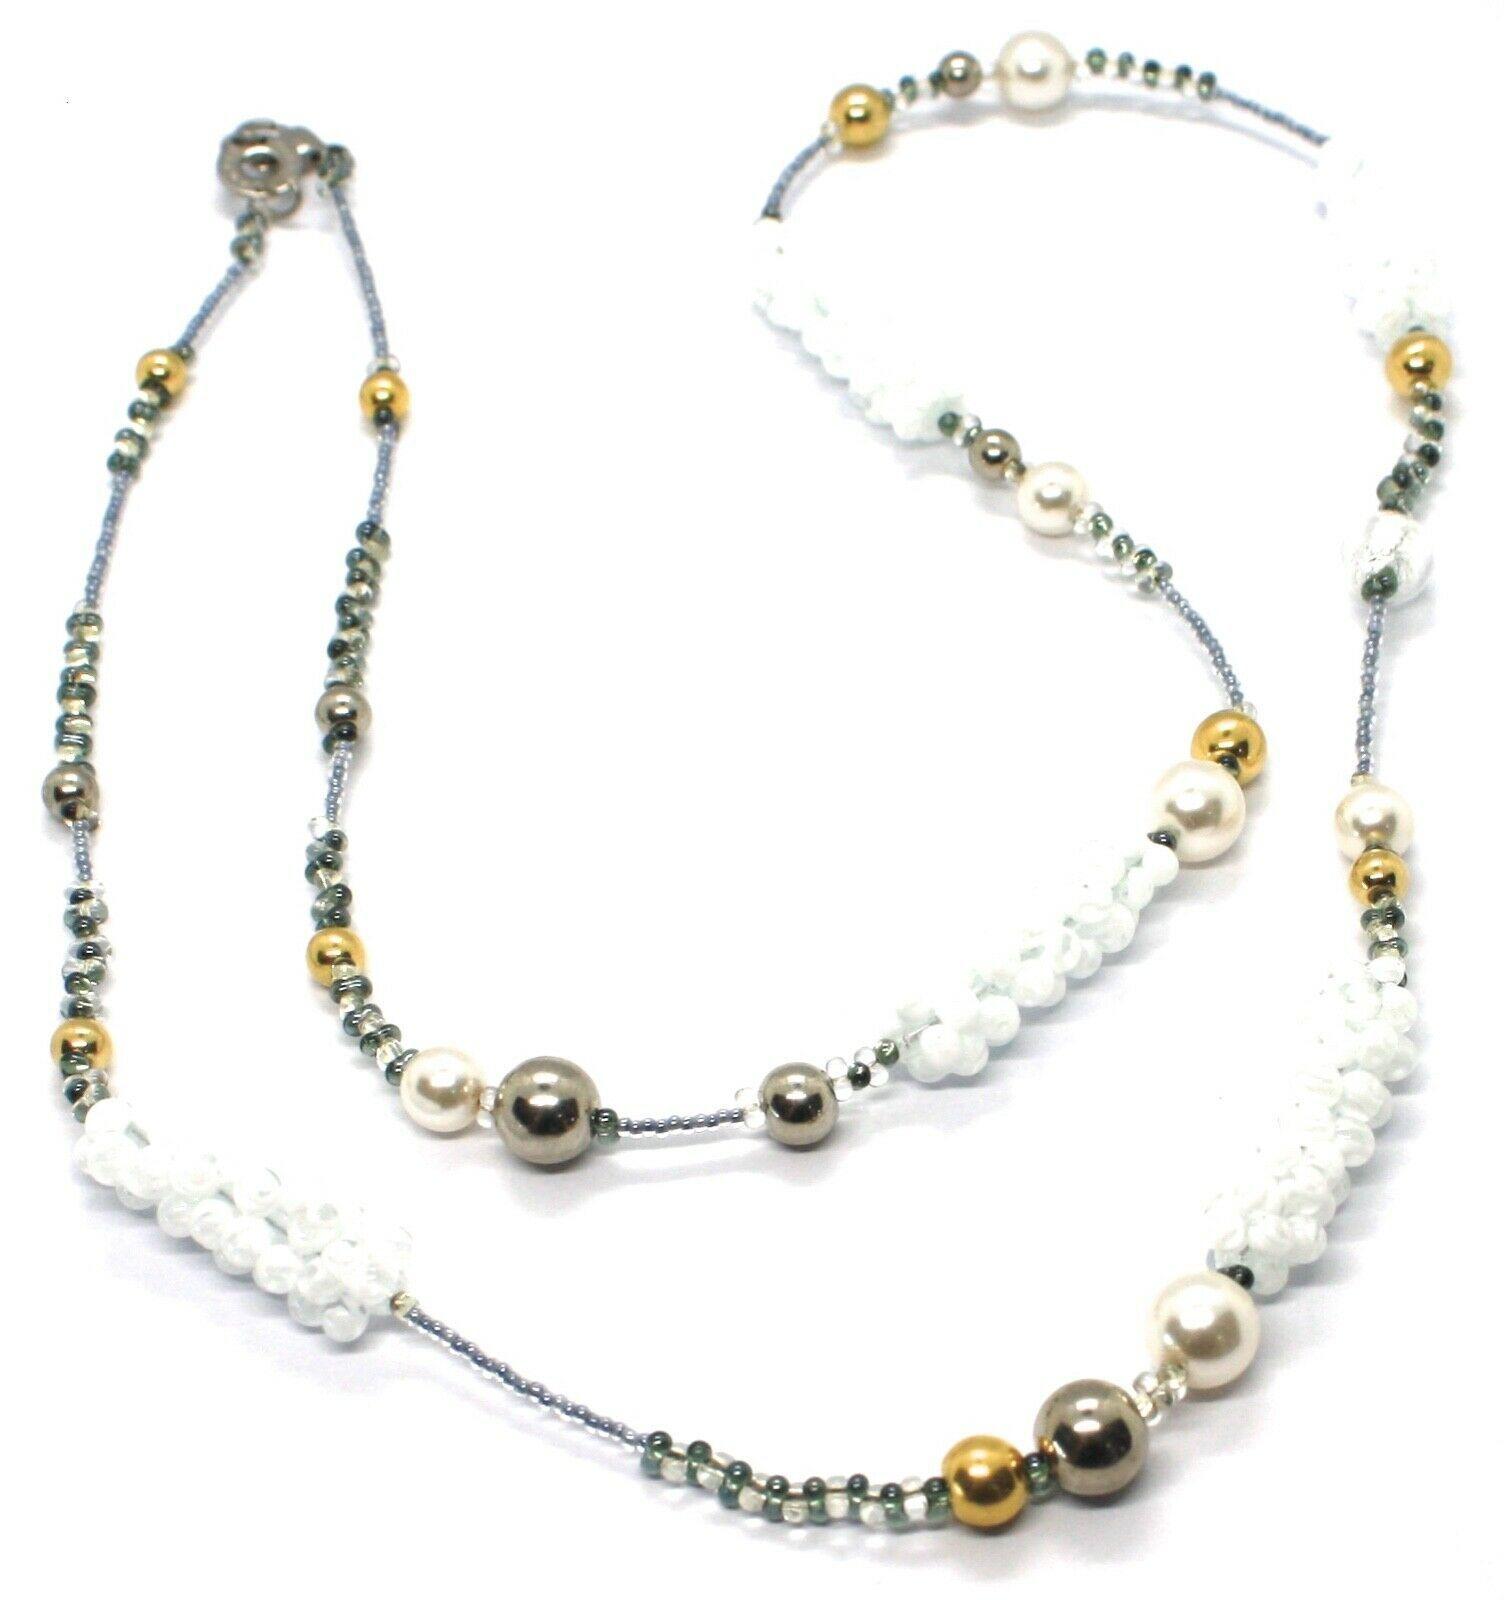 Necklace Antique Murrina, CO746A05, Vines, Spheres, White, 90 cm, Glass Murano